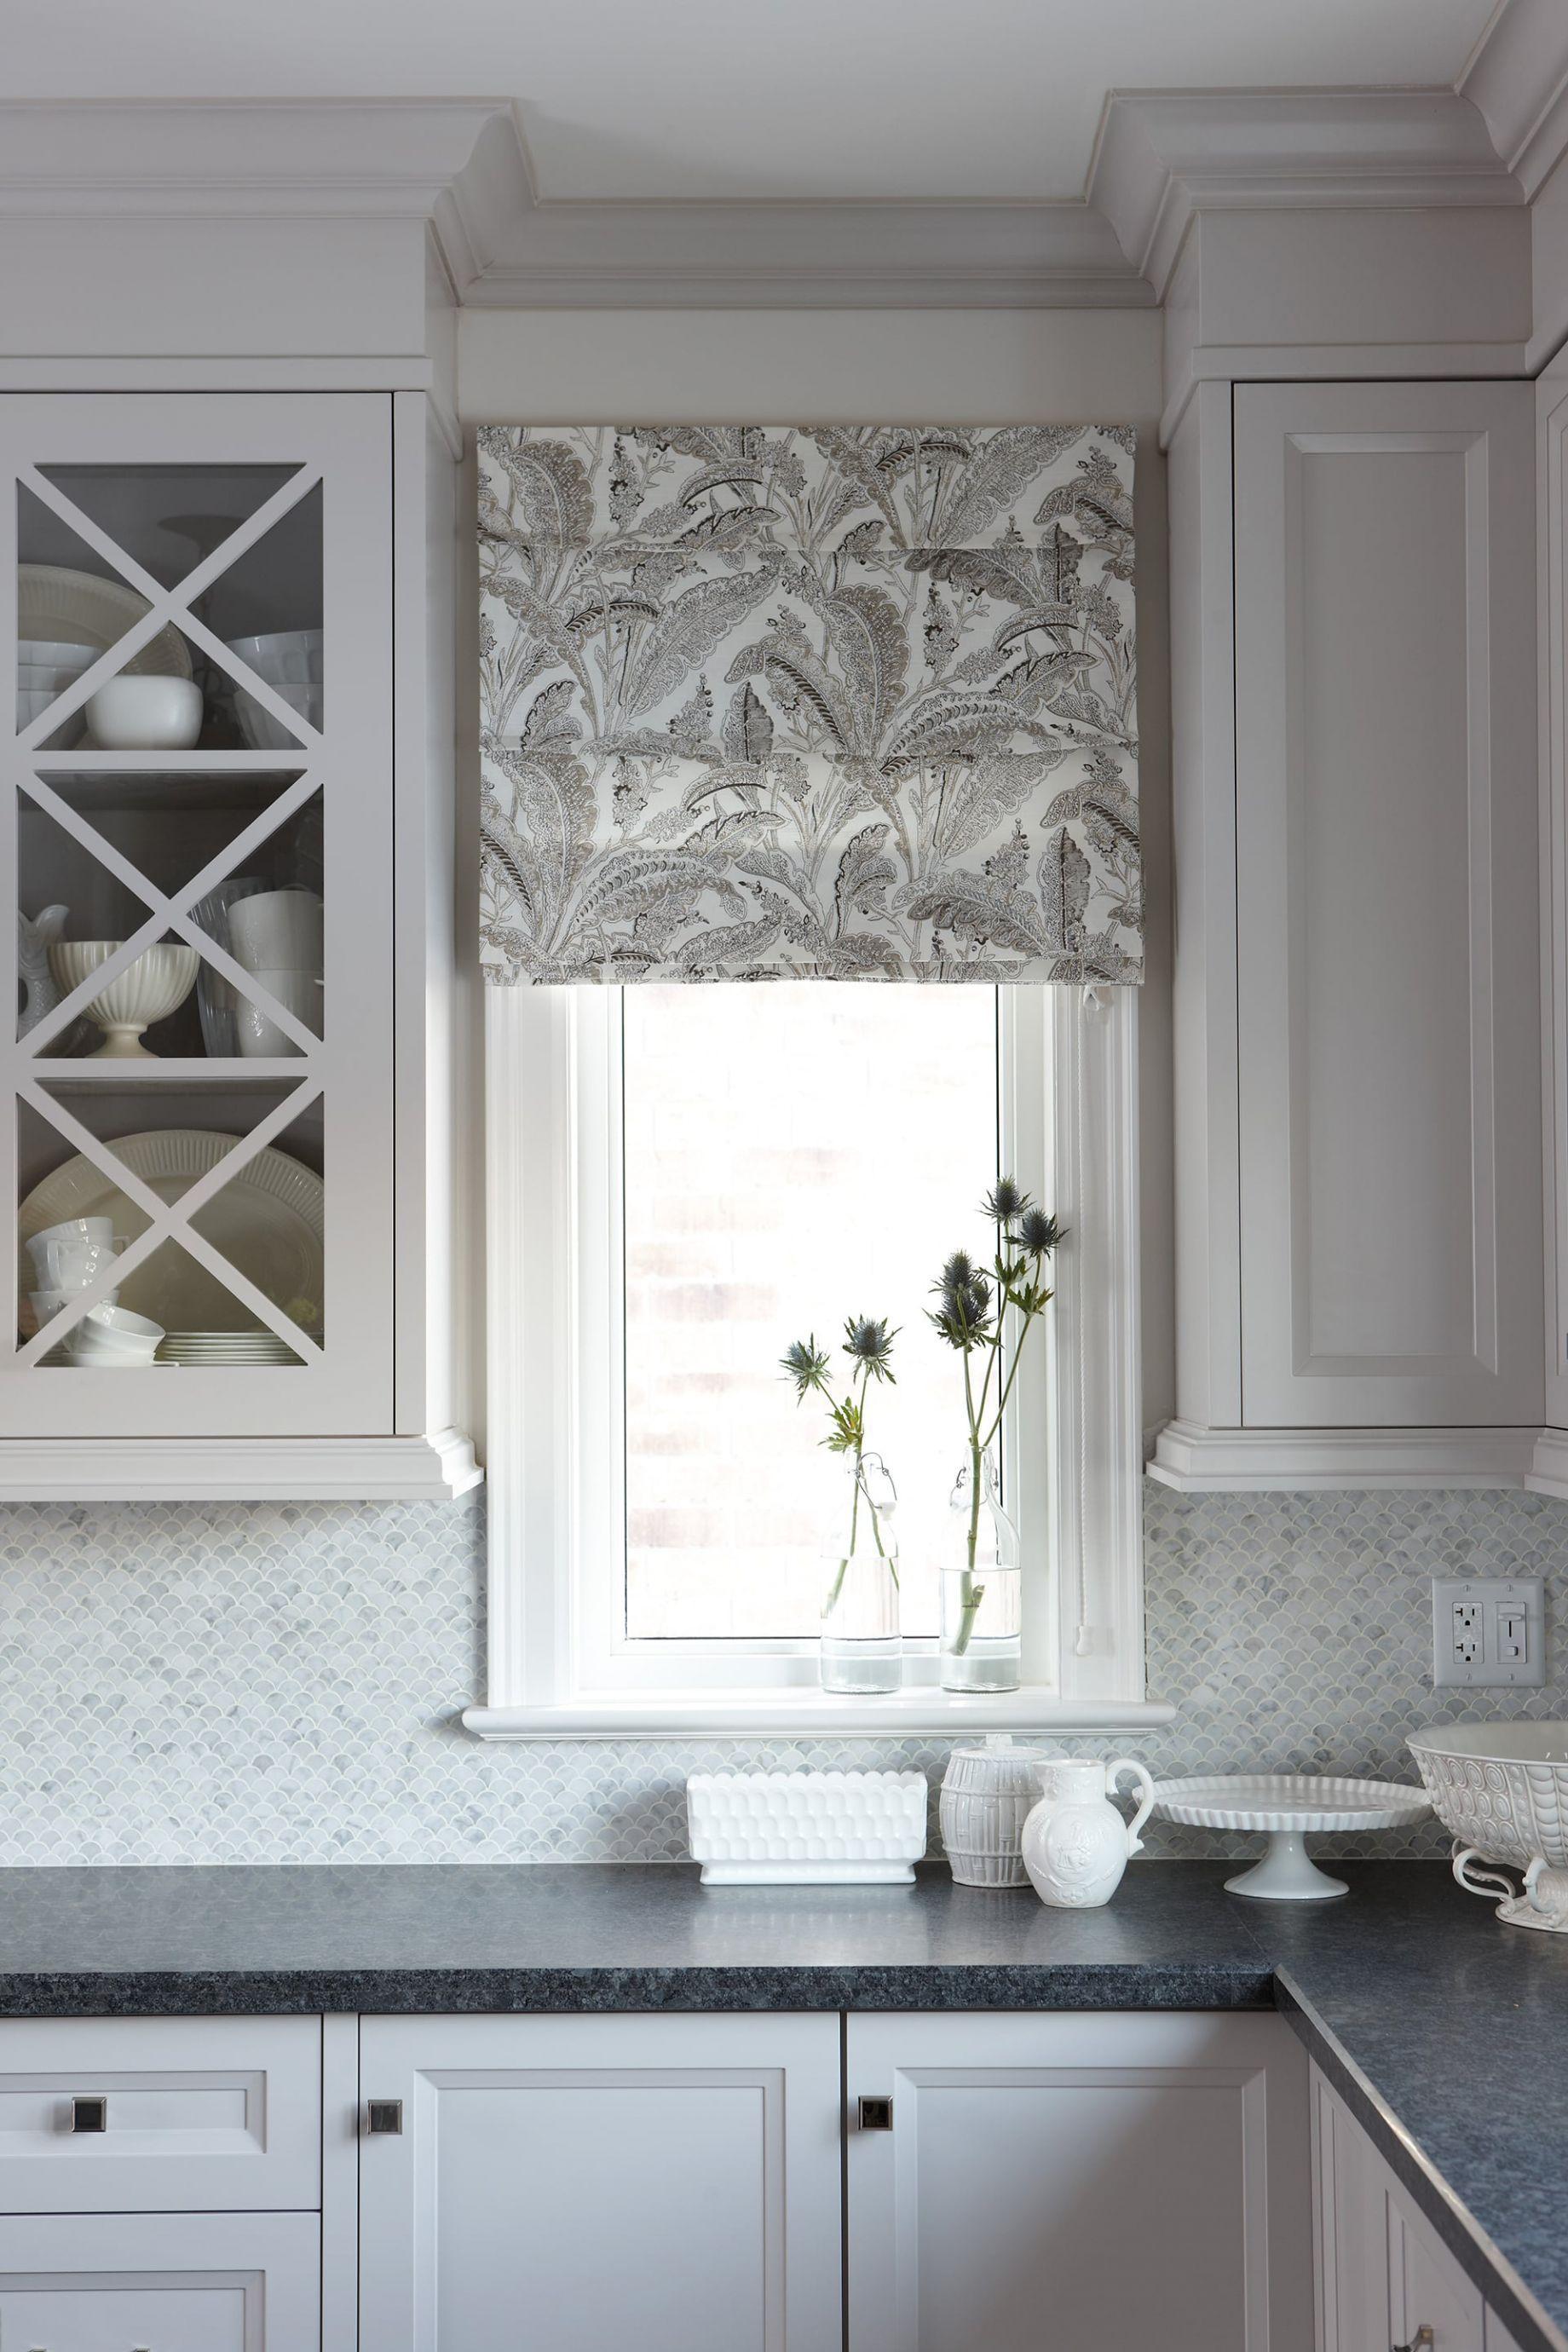 Kitchen window kitchen blinds  kitchen  blinds and counter top woodenverticalblinds